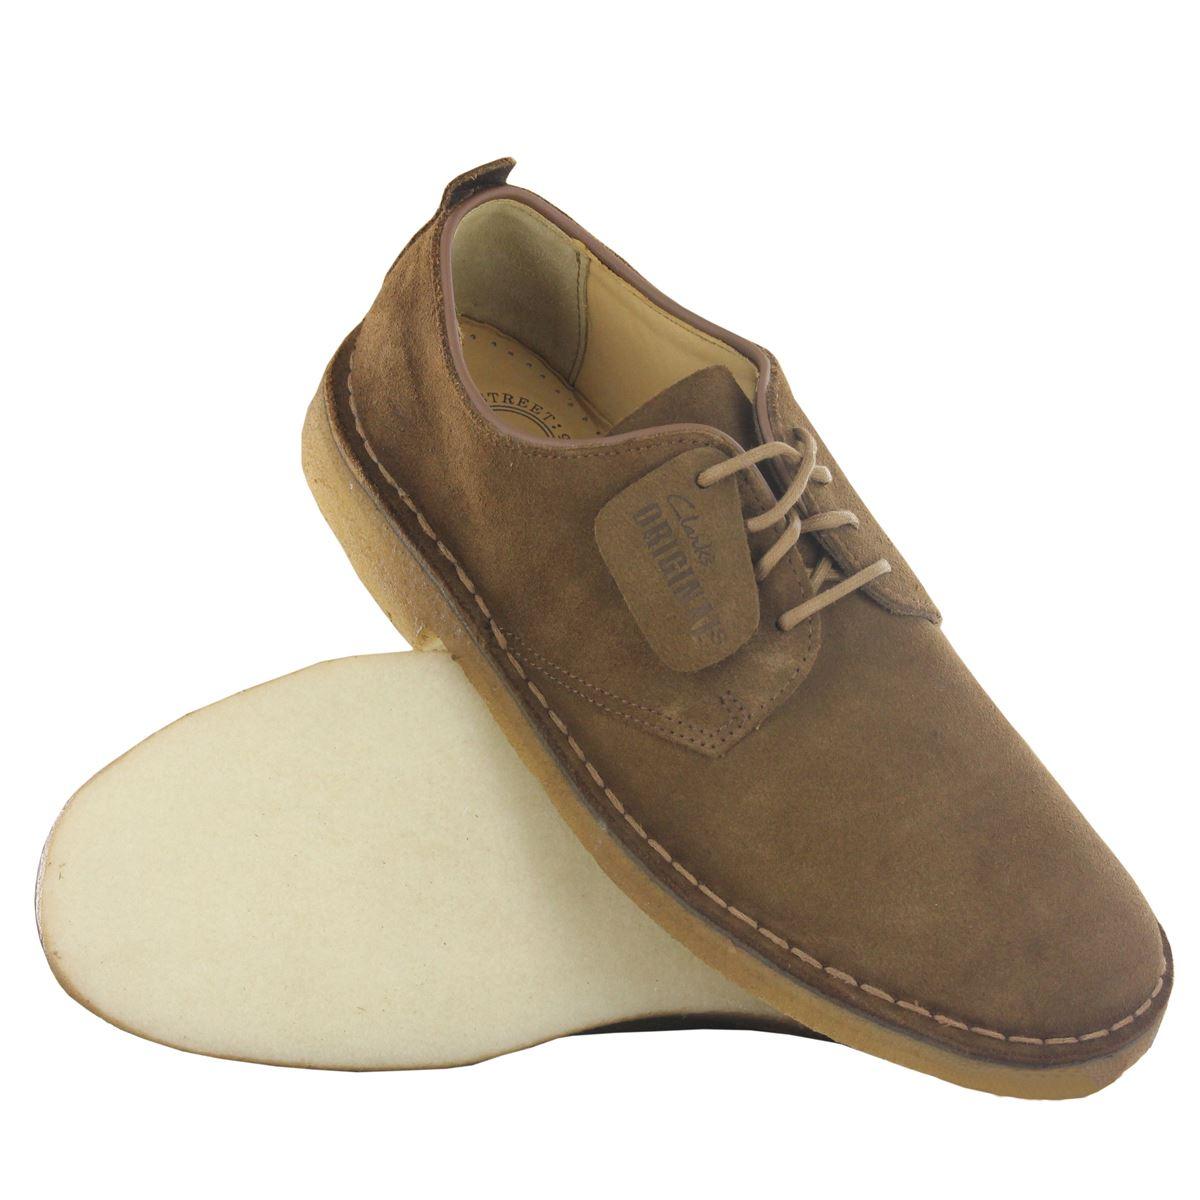 Clarks-Original-Classic-Desert-London-Suede-leather-Mens-